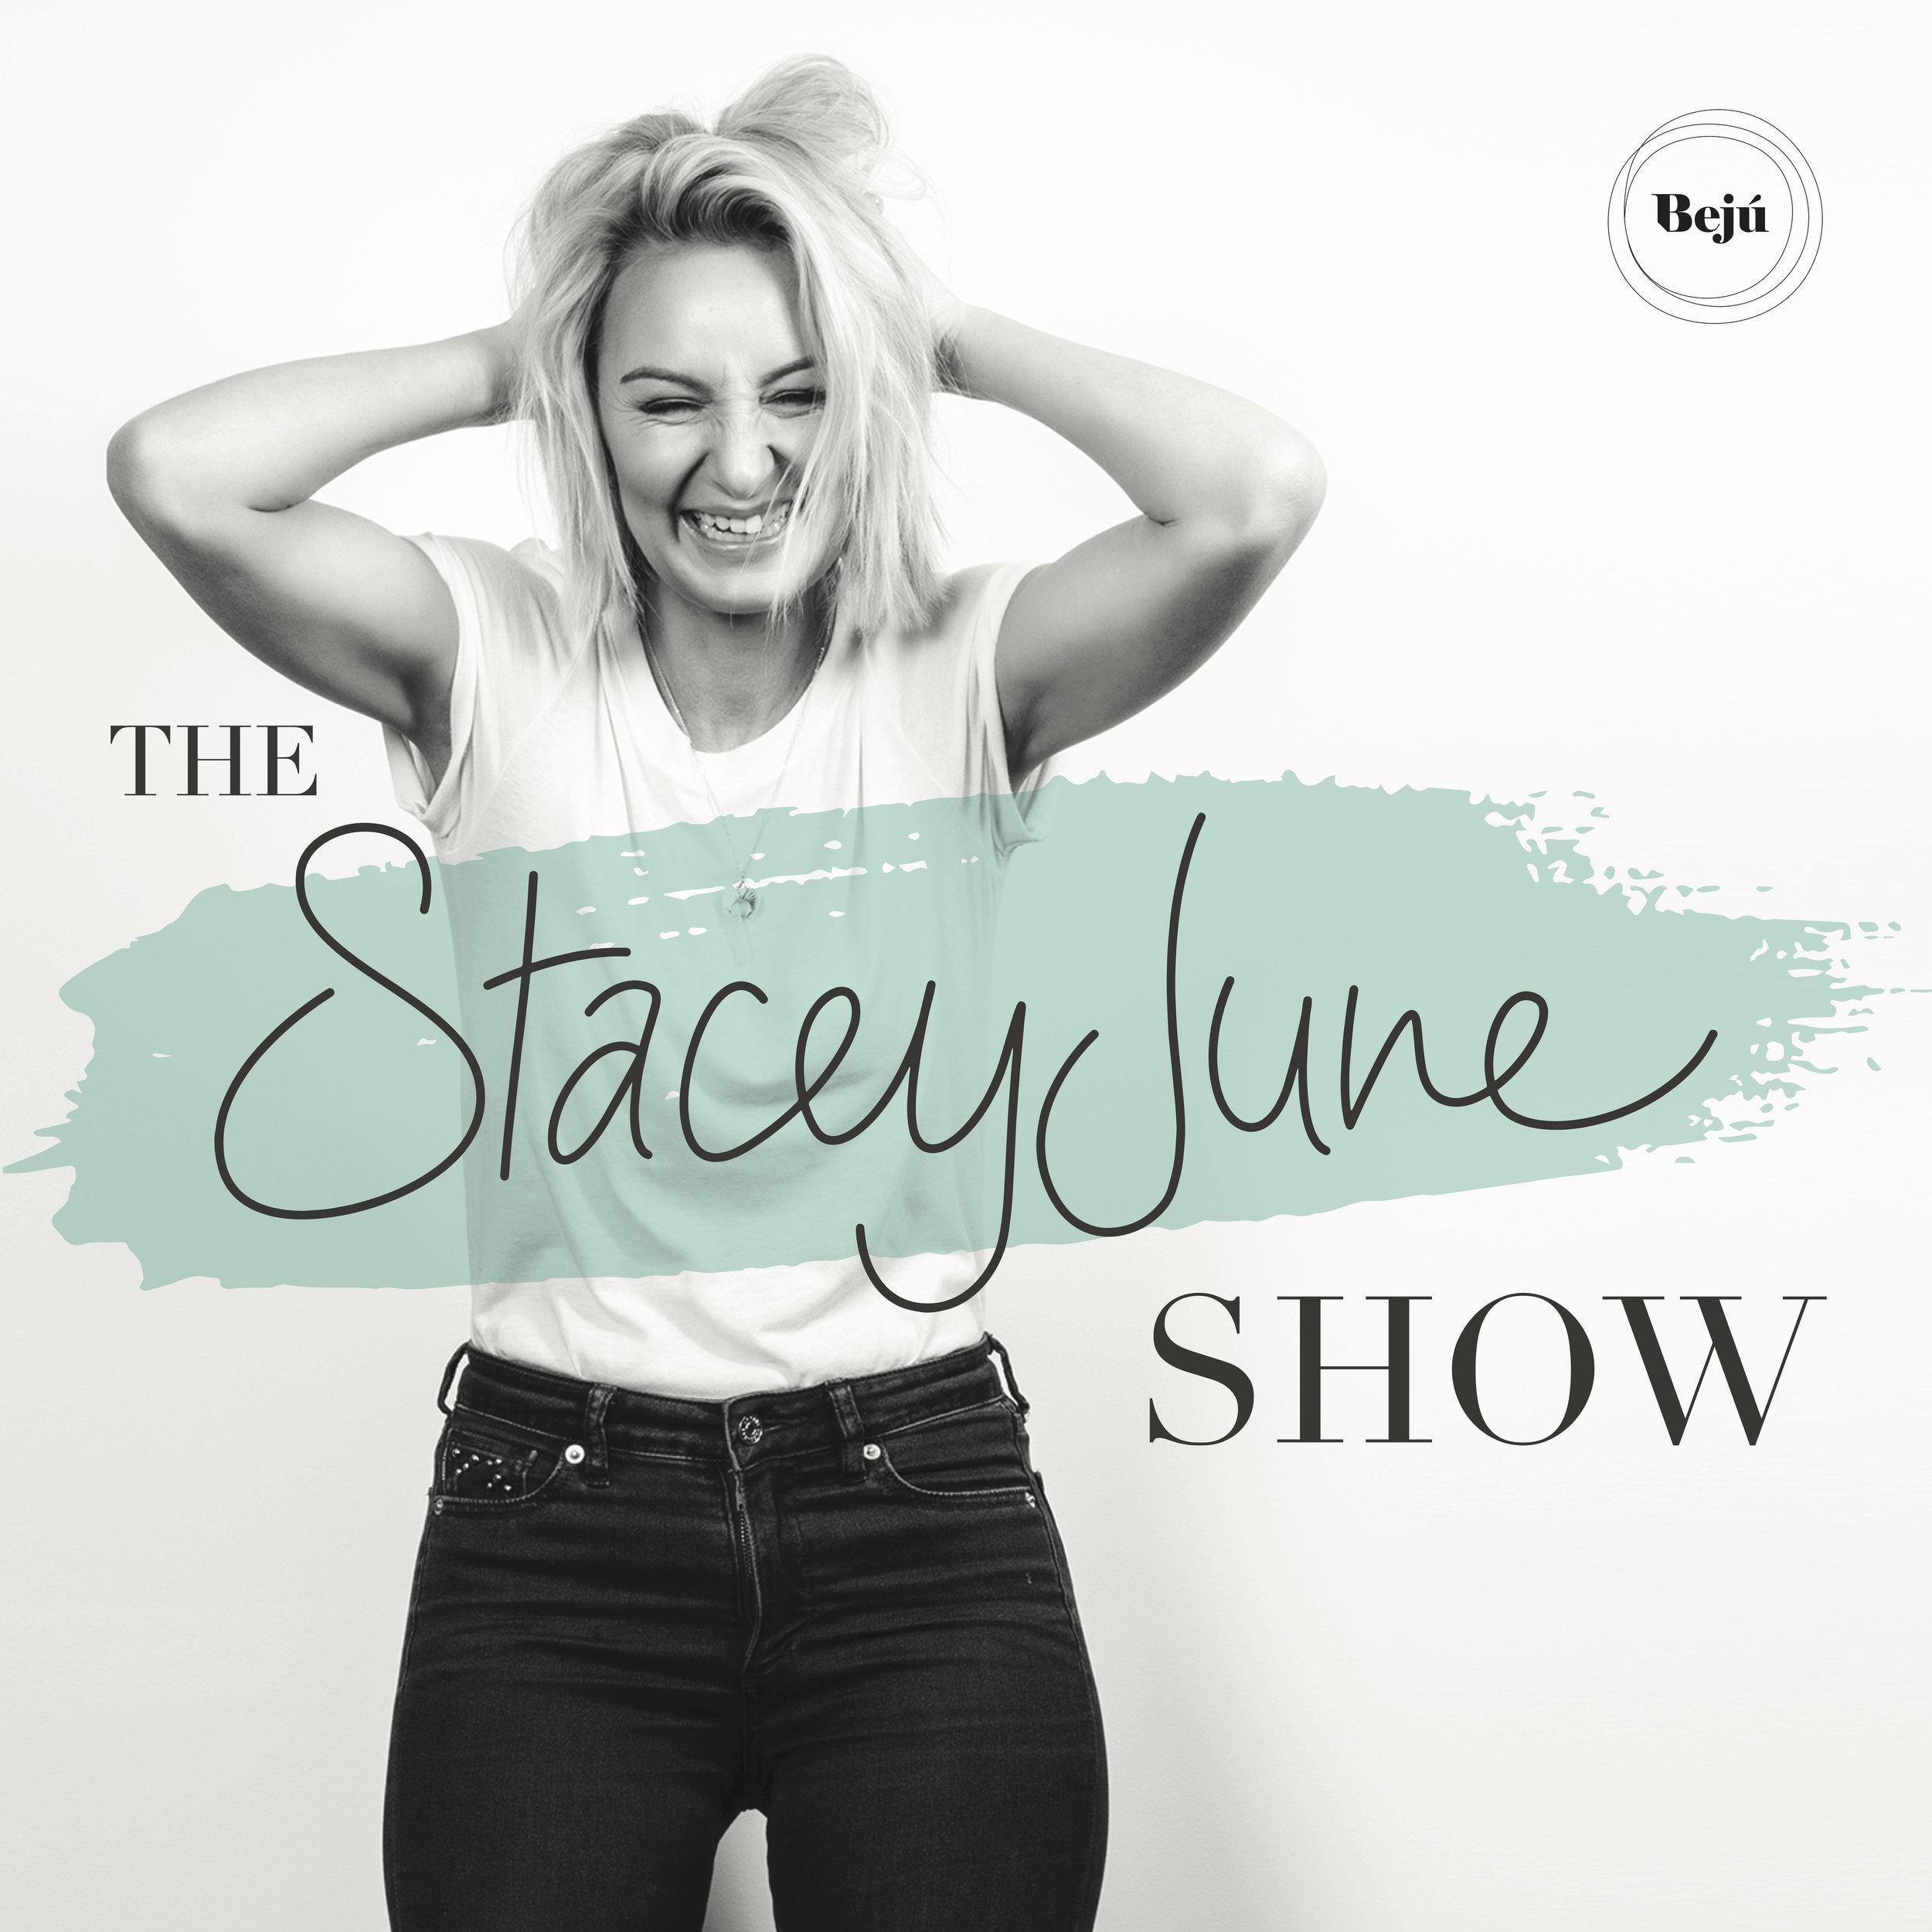 Stacey_June_Podcast_Final_Beju.jpg